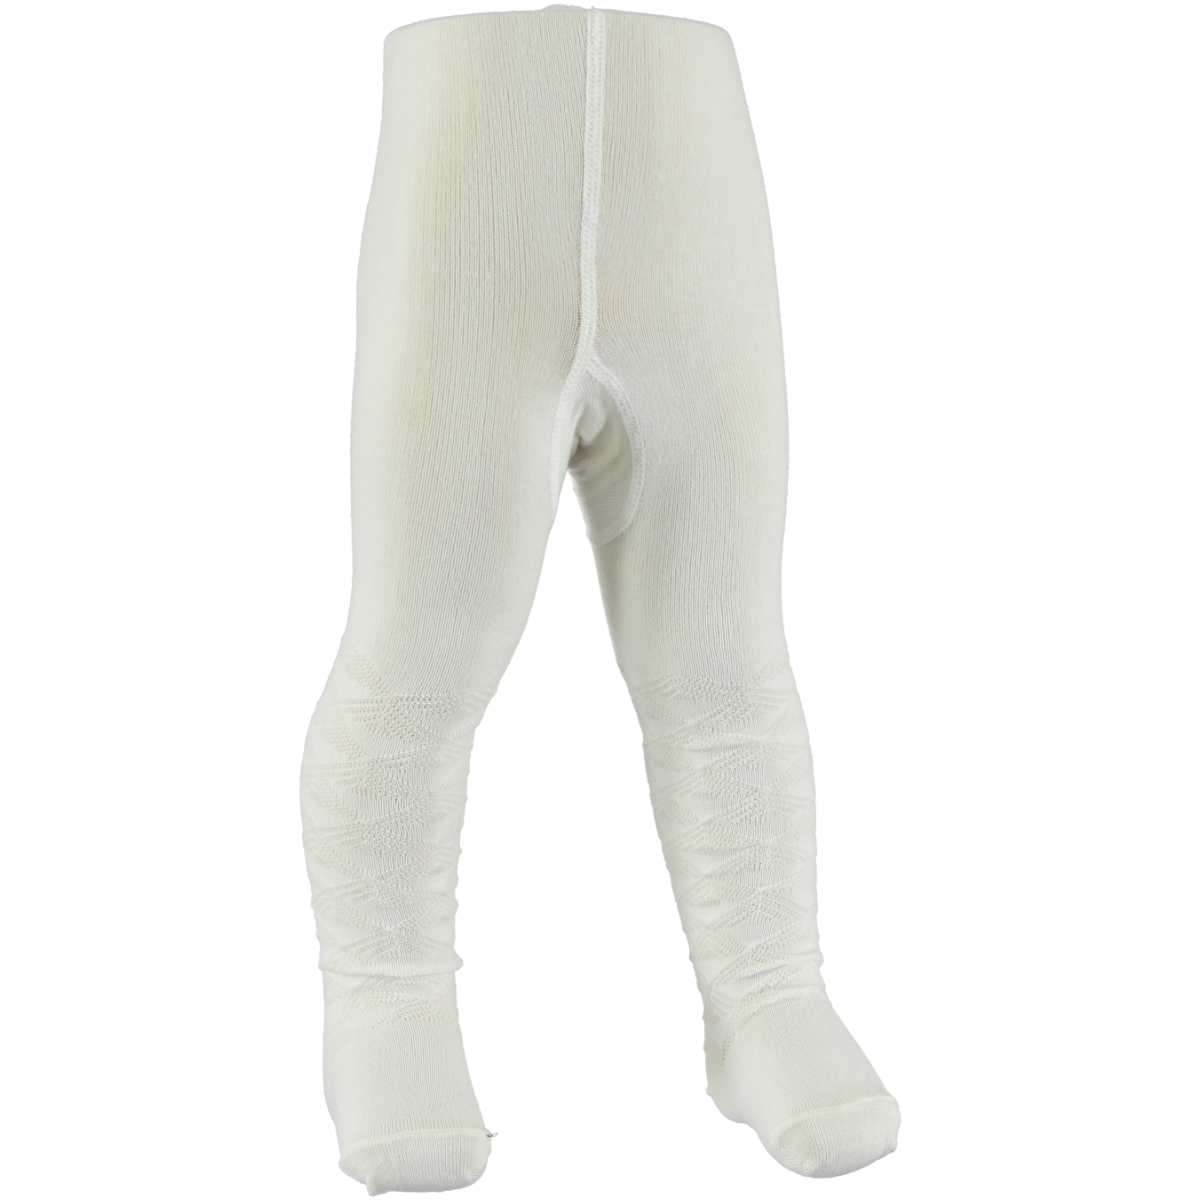 Civil Ecru Pantyhose 0-12 Years